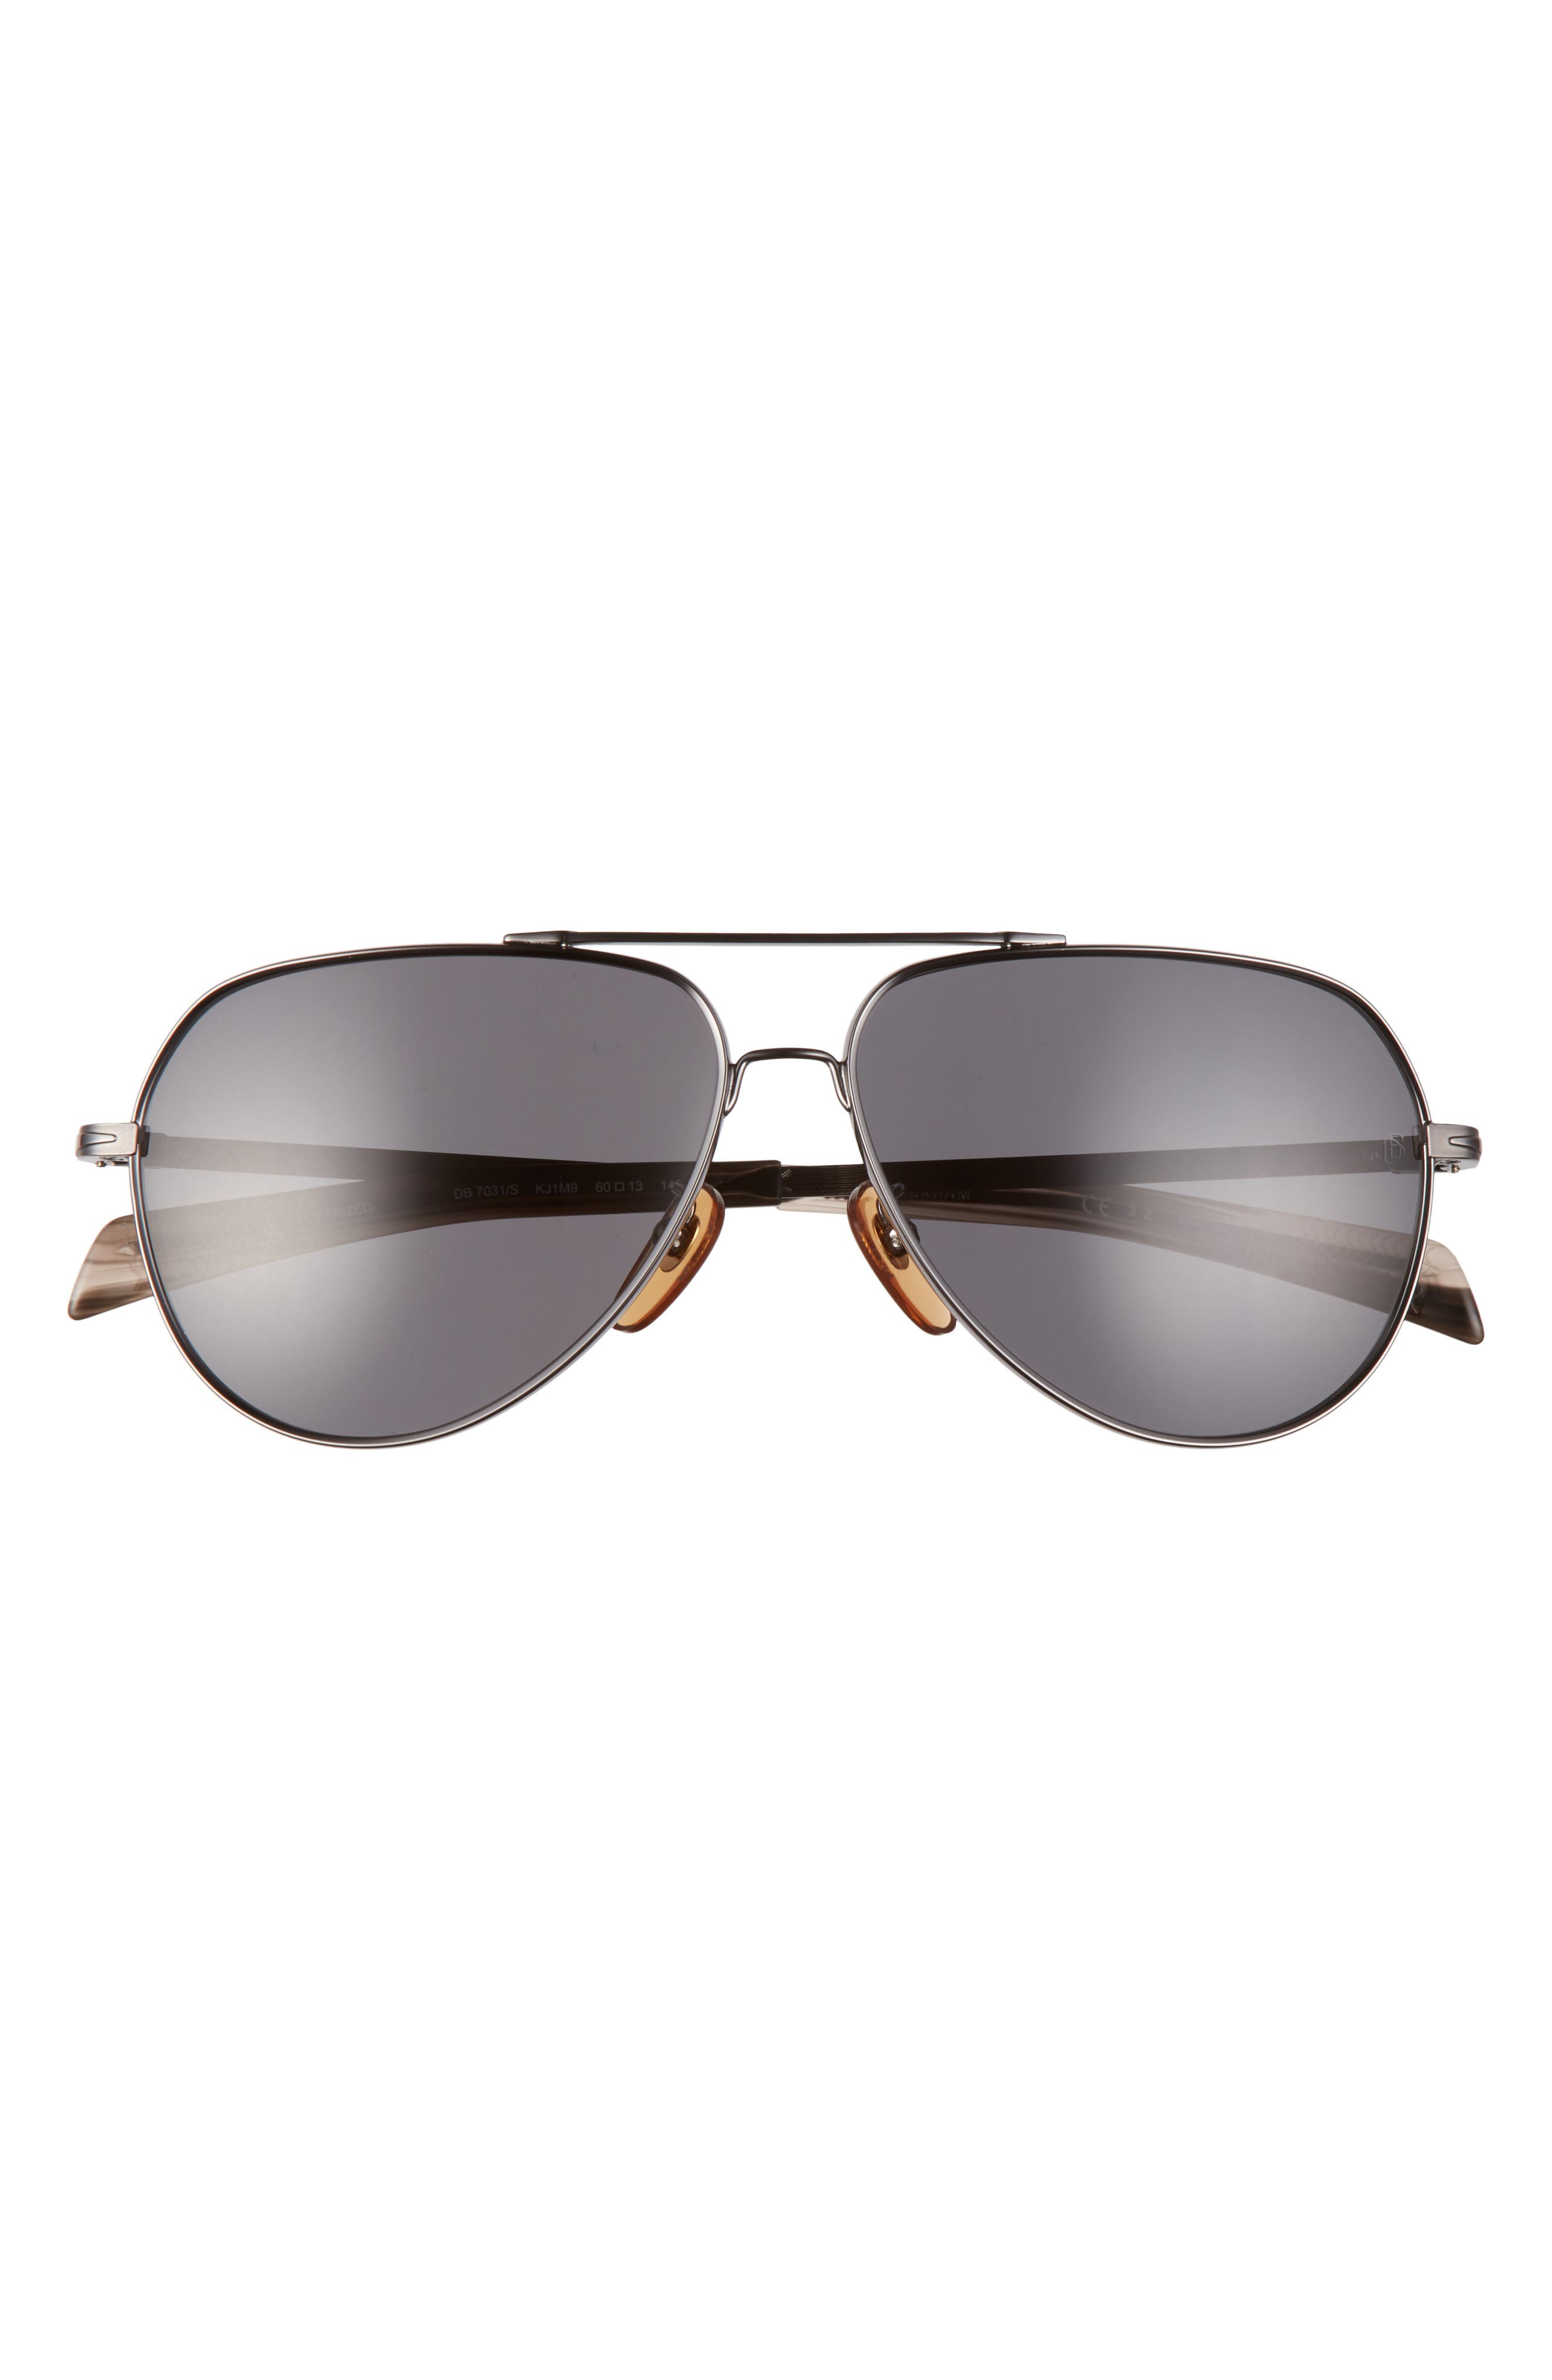 Men's Eyewear By David Beckham 60mm Polarized Aviator Sunglasses